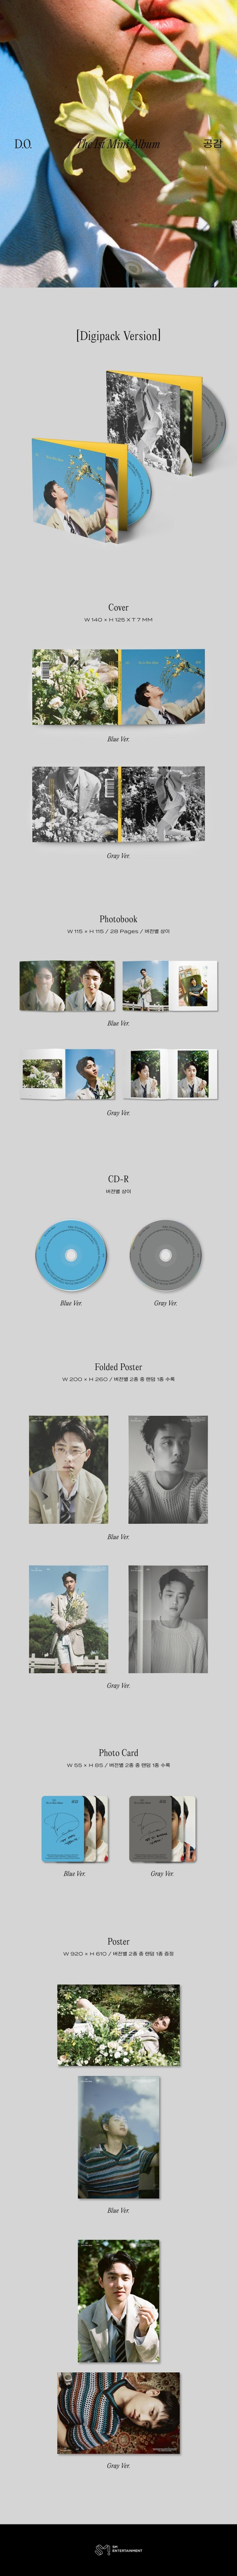 D.O(EXO) ファースト・ソロミニアルバム『共感』 